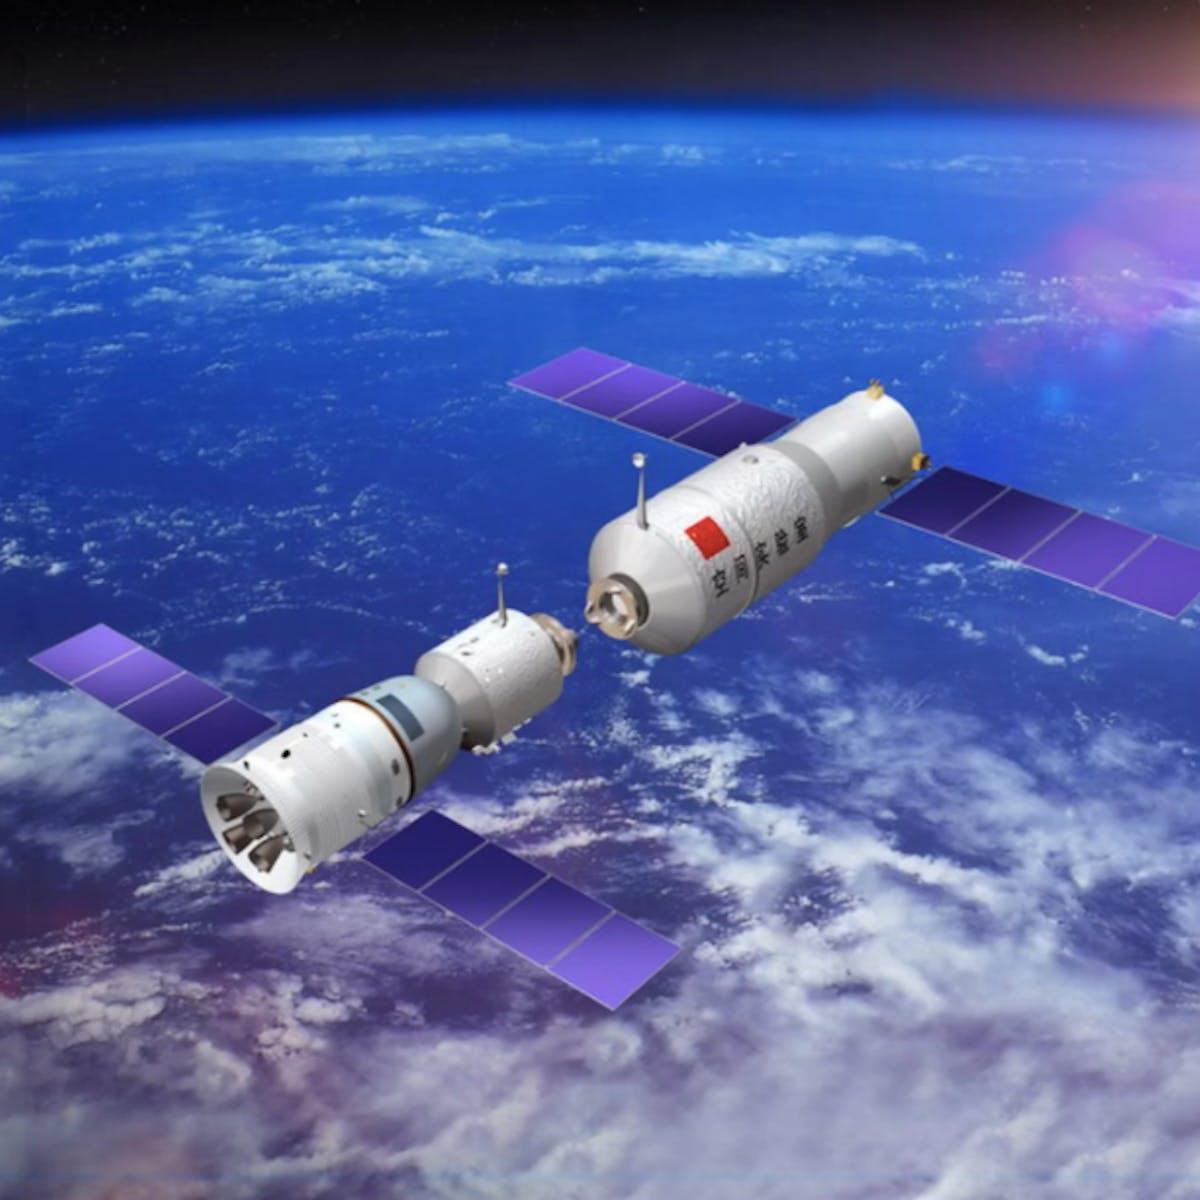 Elon Musk praises China's space industry after reaching big milestone